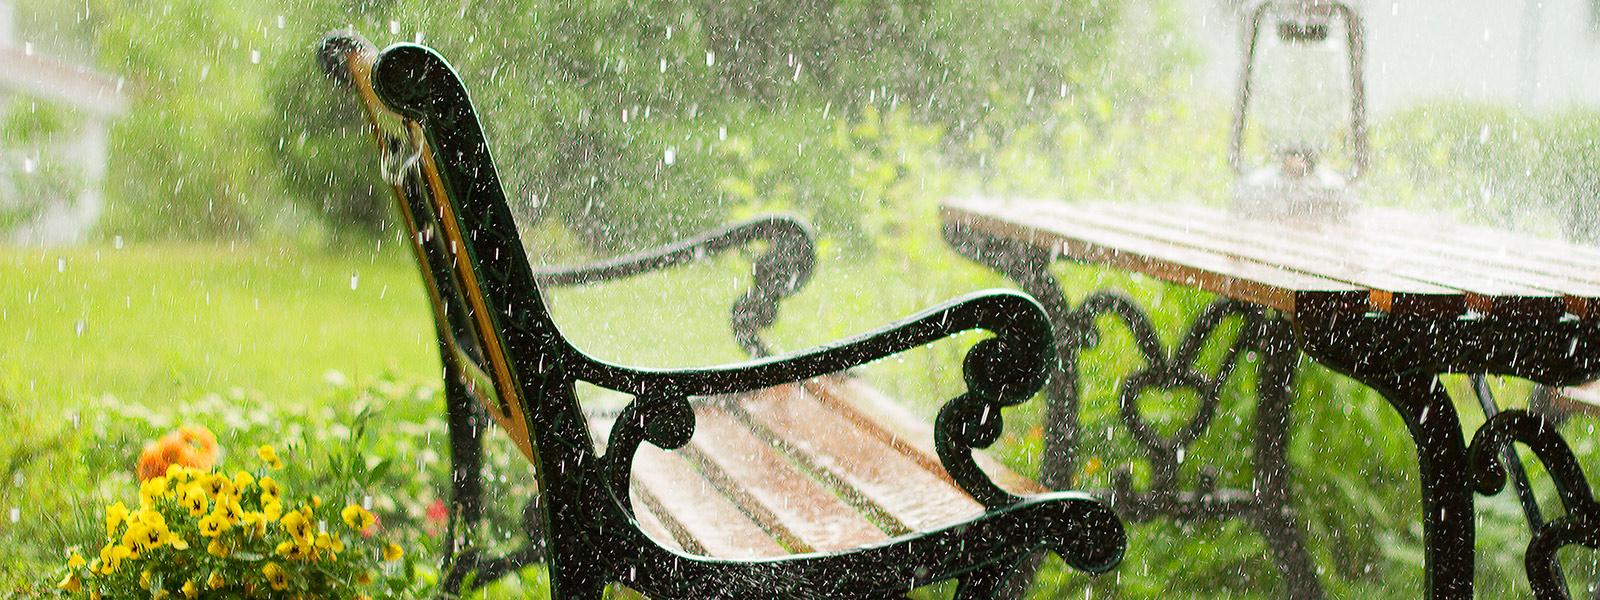 Heavy rain and yard bech